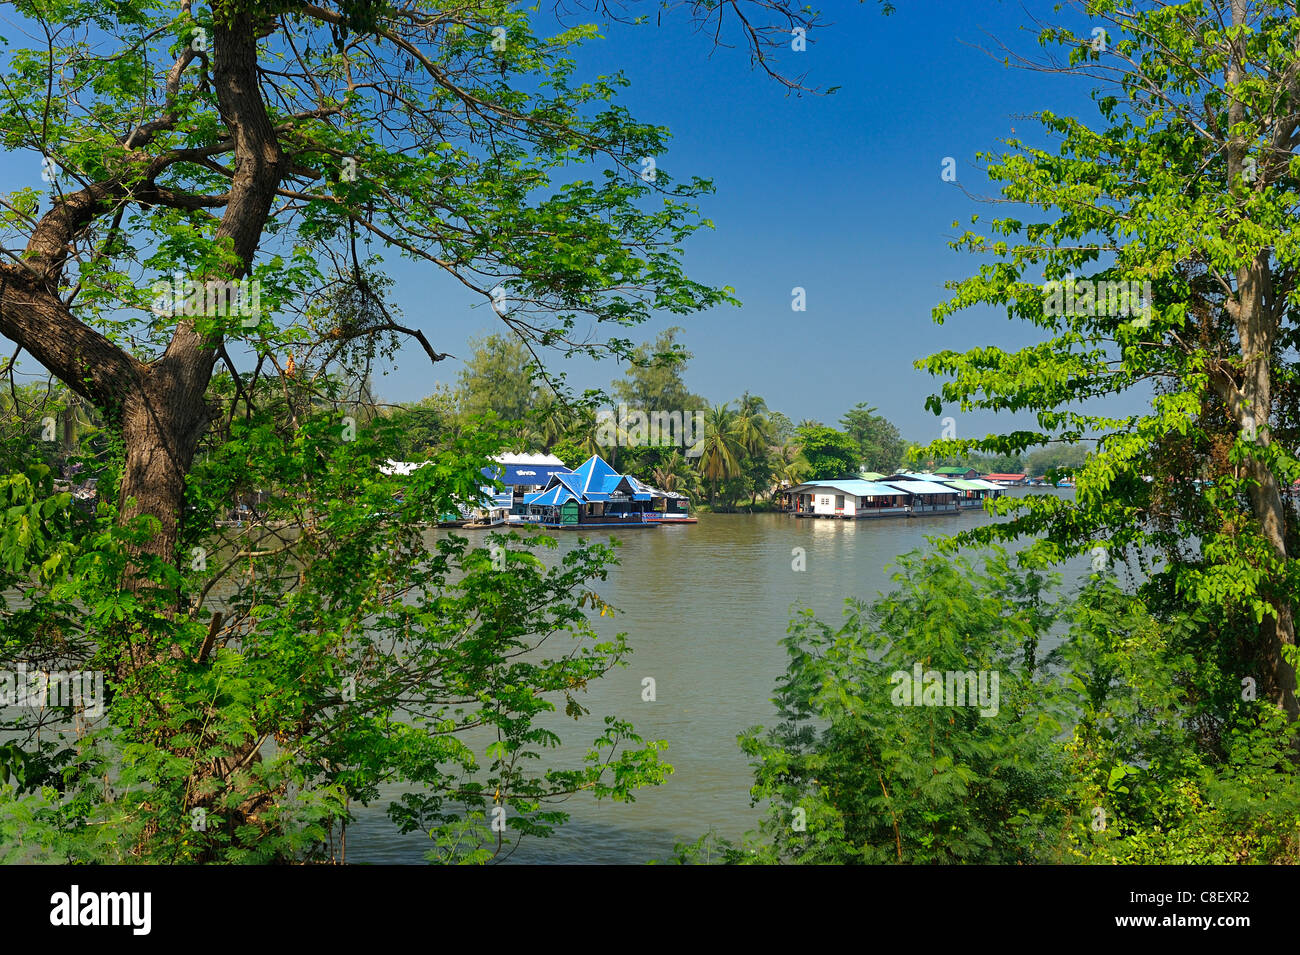 Mae Klong, River, Kanchanaburi, Thailand, Asia, trees - Stock Image